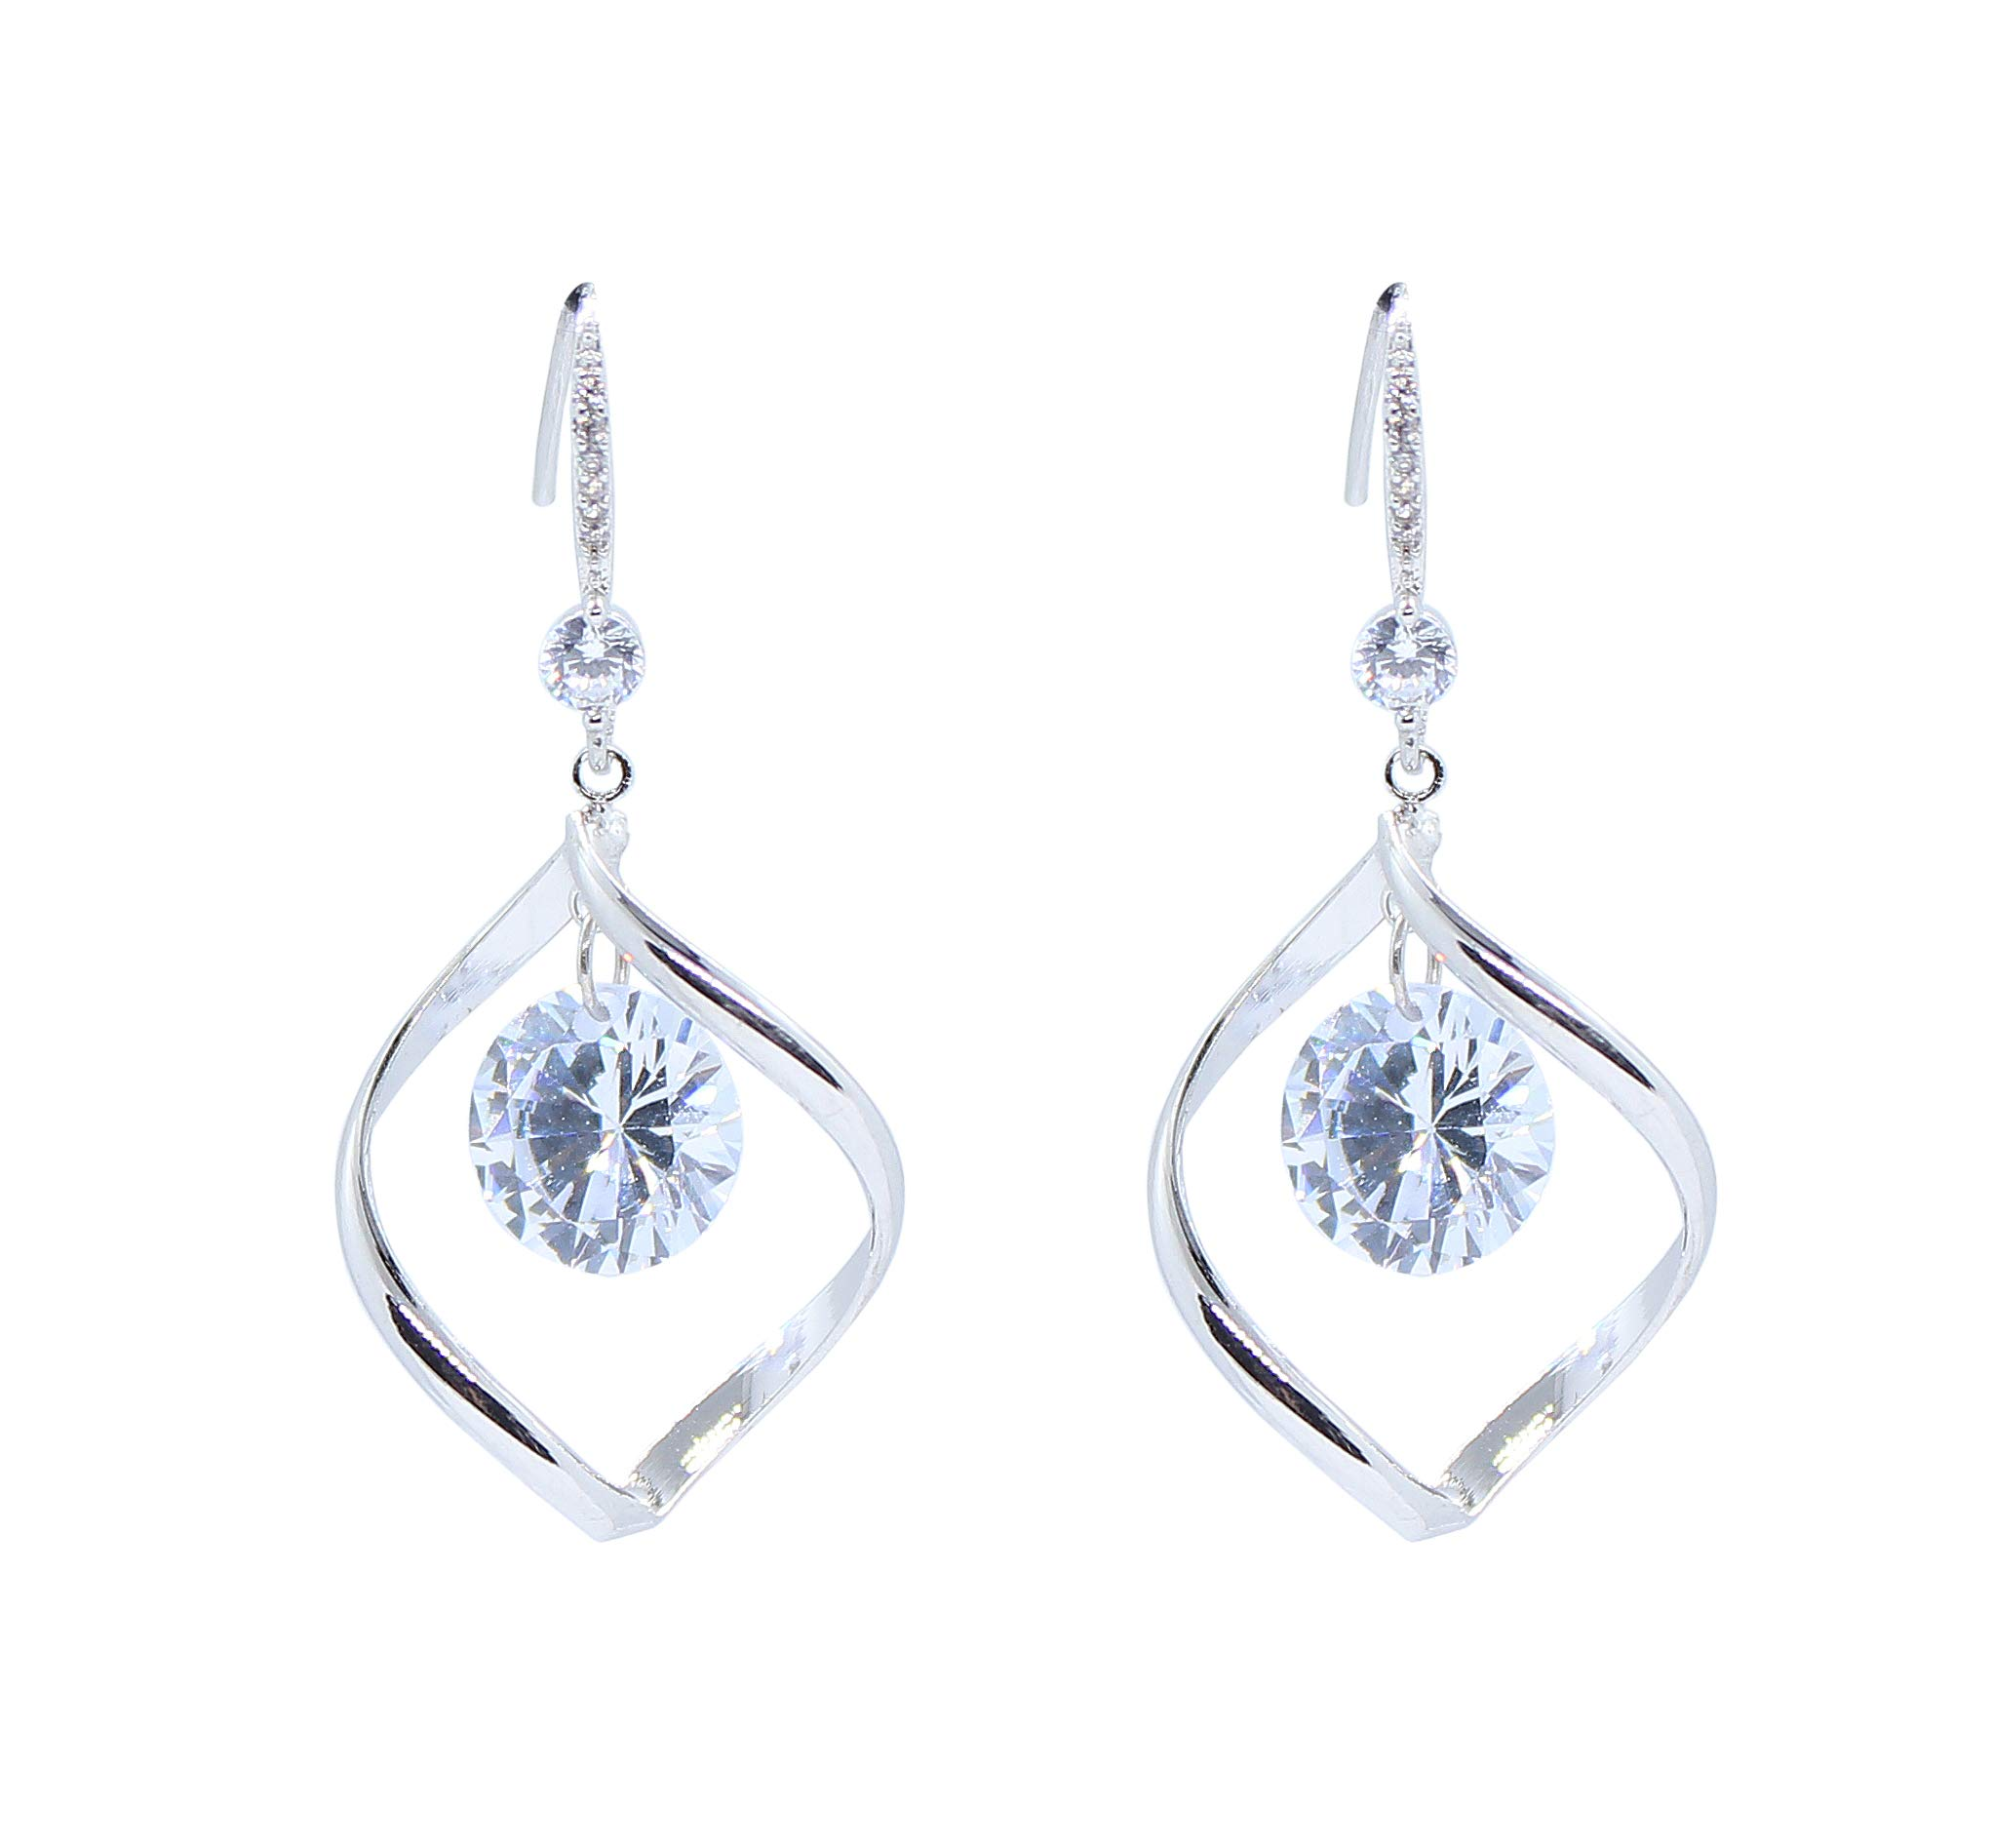 Goddess Area Pearl Drop Vintage Wedding Dangle Earrings(Silver Twisted Crystal)